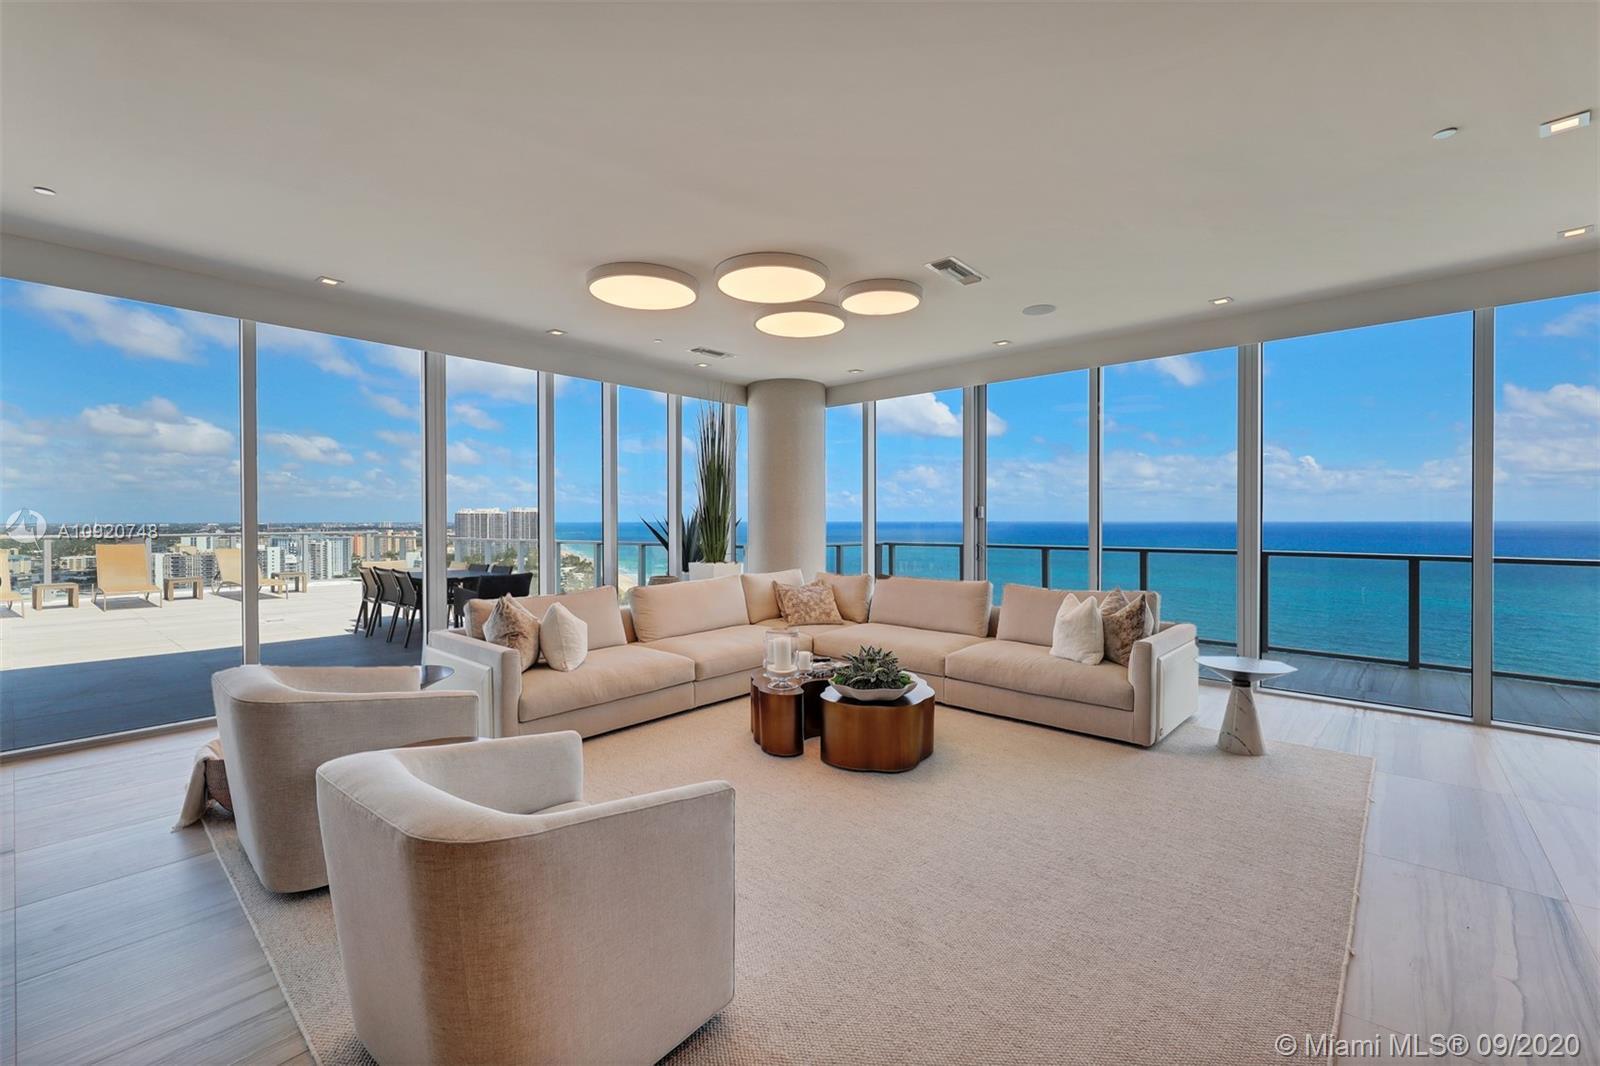 Auberge Beach Residences & Spa image #1